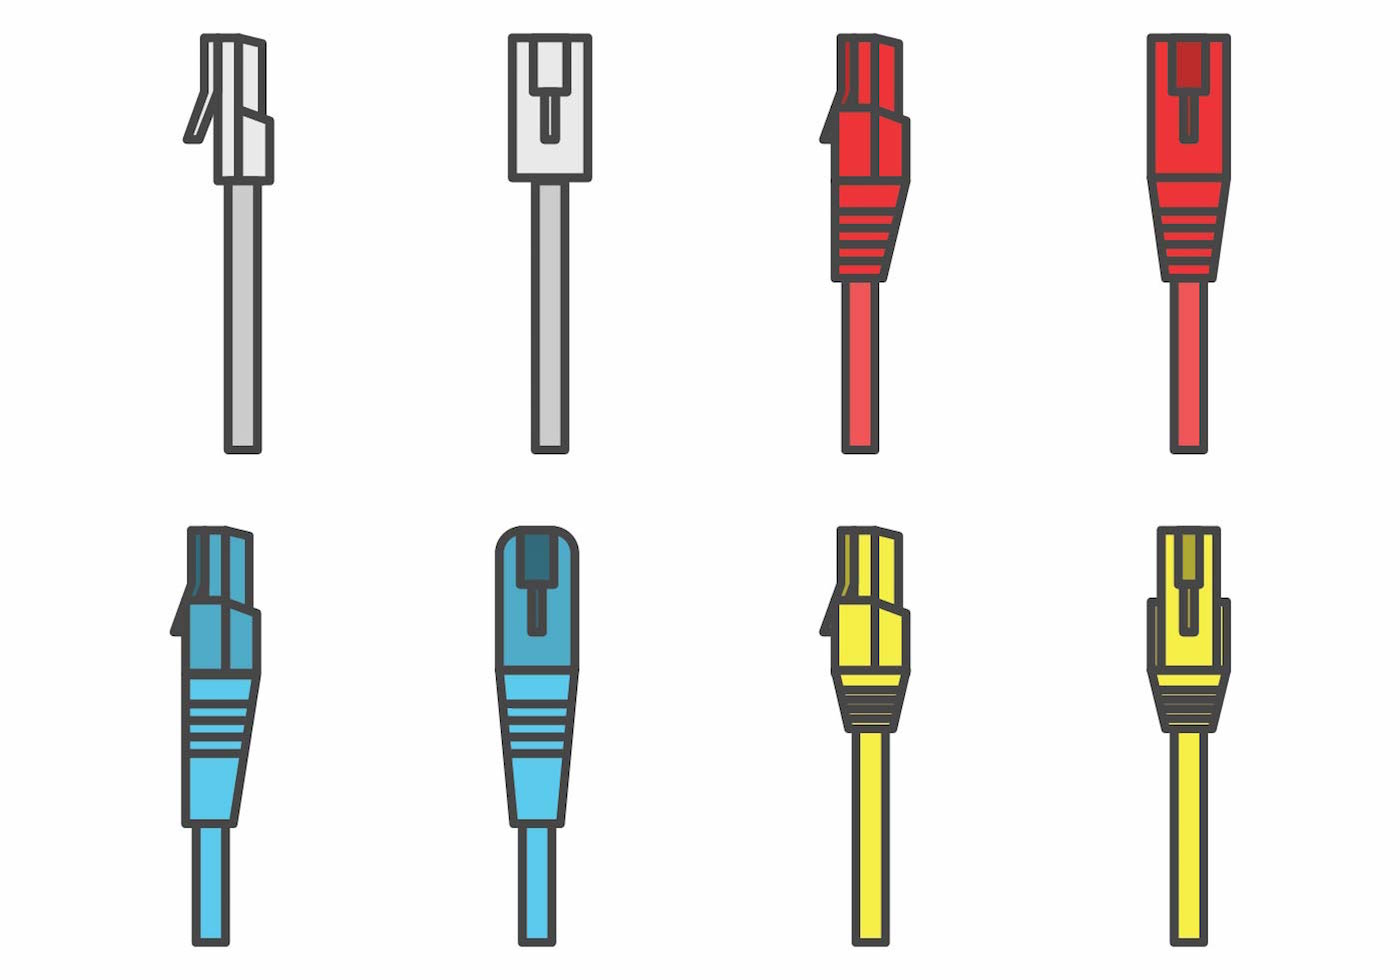 Flat Rj45 Connector Set